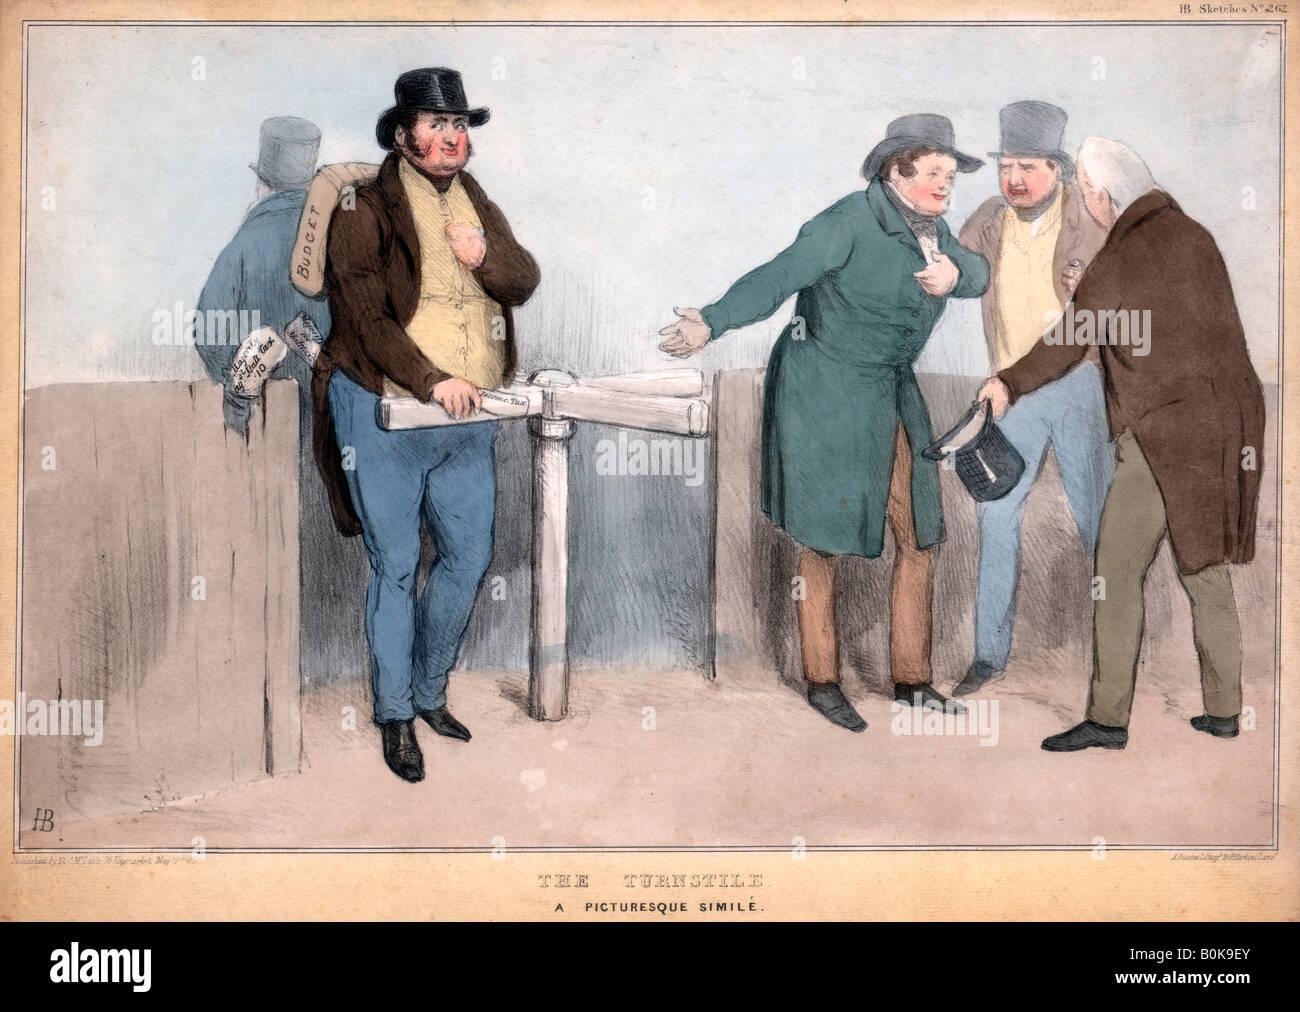 'The Turnstile, A Picturesque Simile', 19th century.  Artist: John Doyle - Stock Image